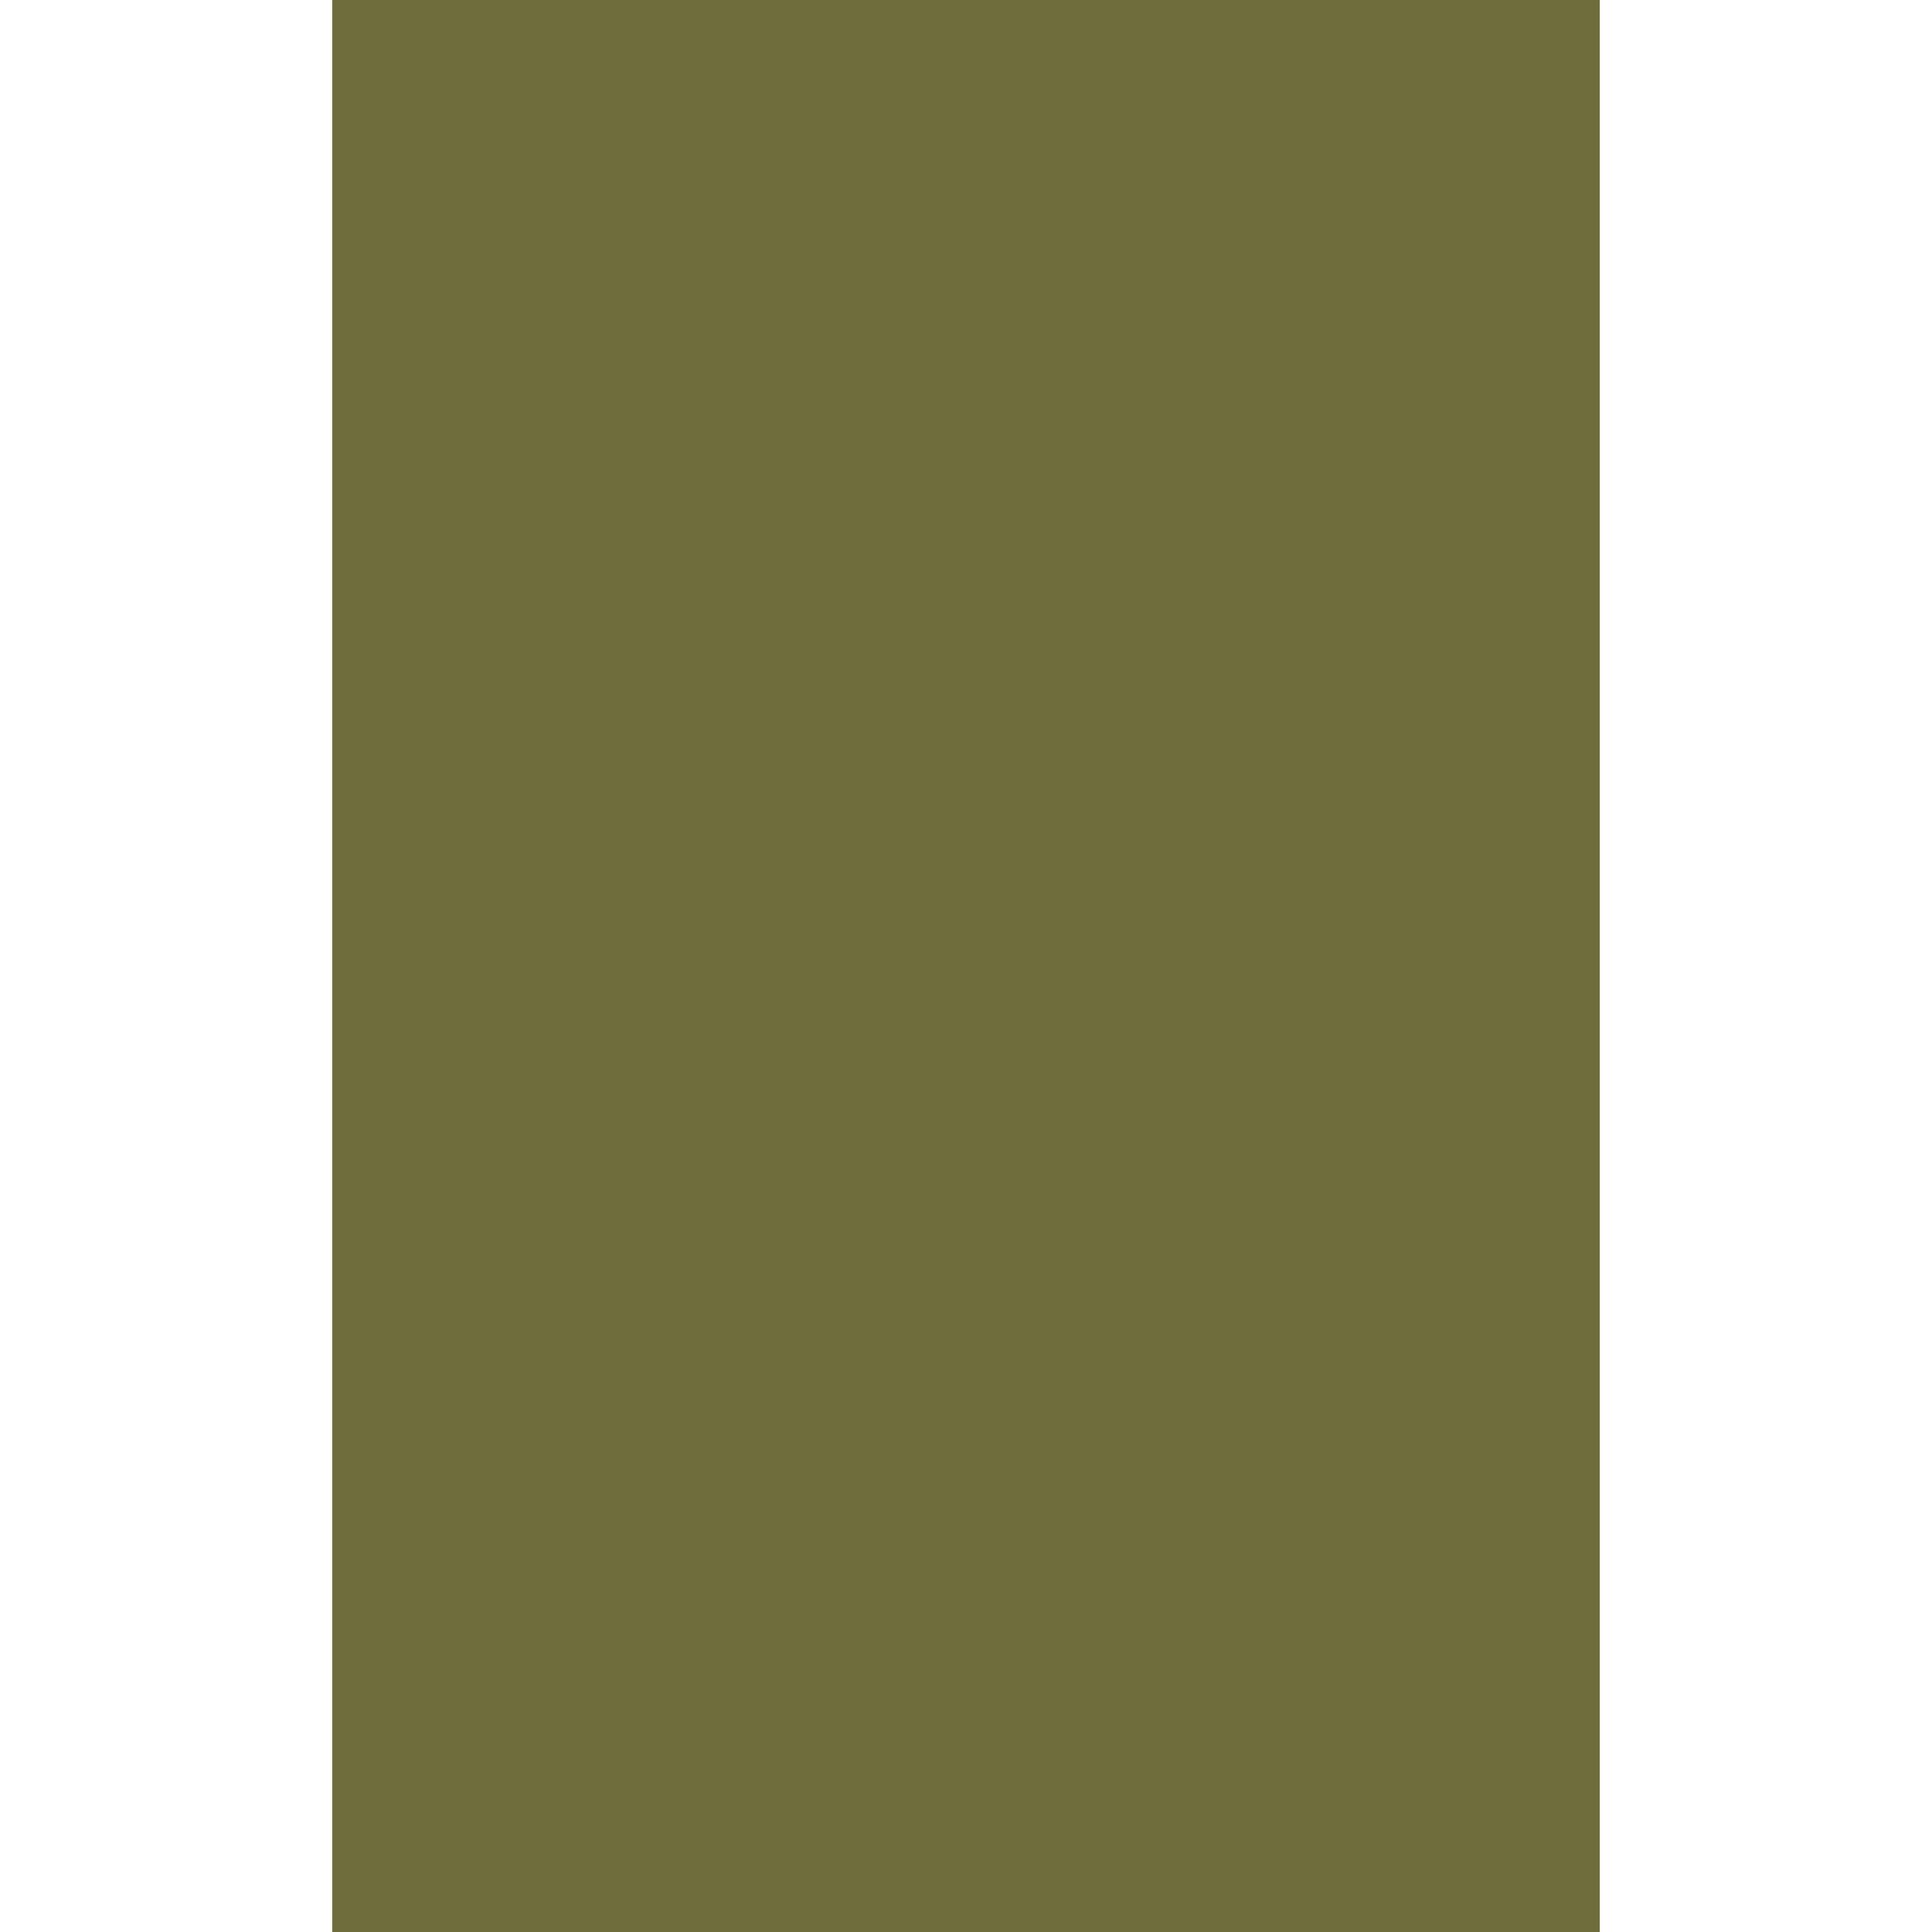 Koppel Hand-Woven Dark Green/Khaki Area Rug Rug Size: Rectangle 5' x 7'6